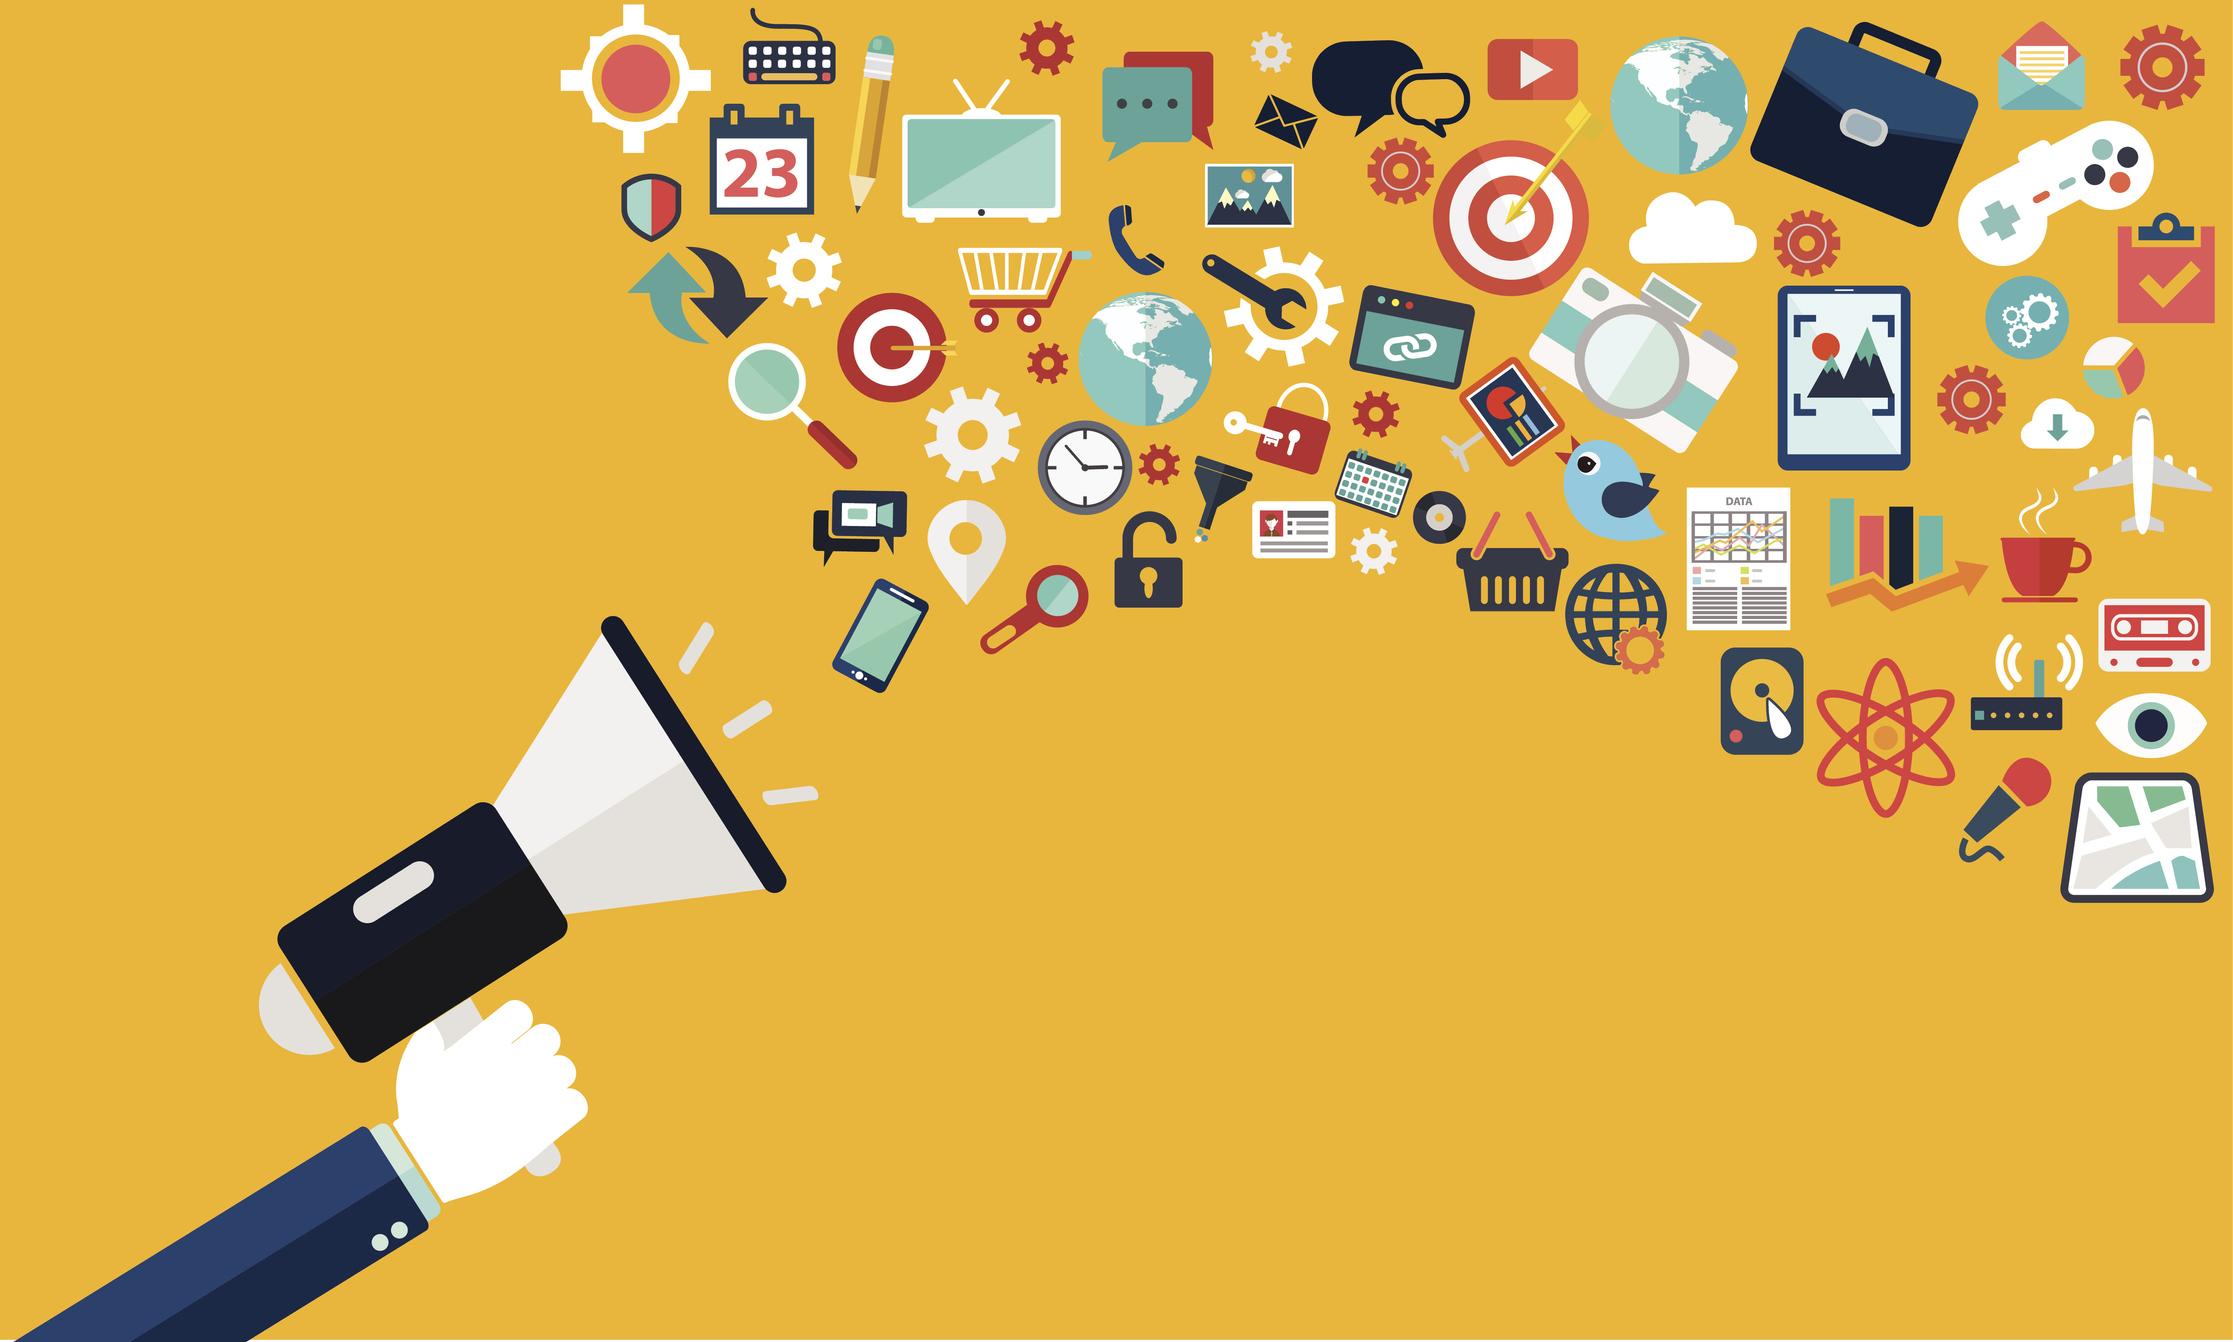 18 Expert Tips for Building Greater Brand Awareness in 2020